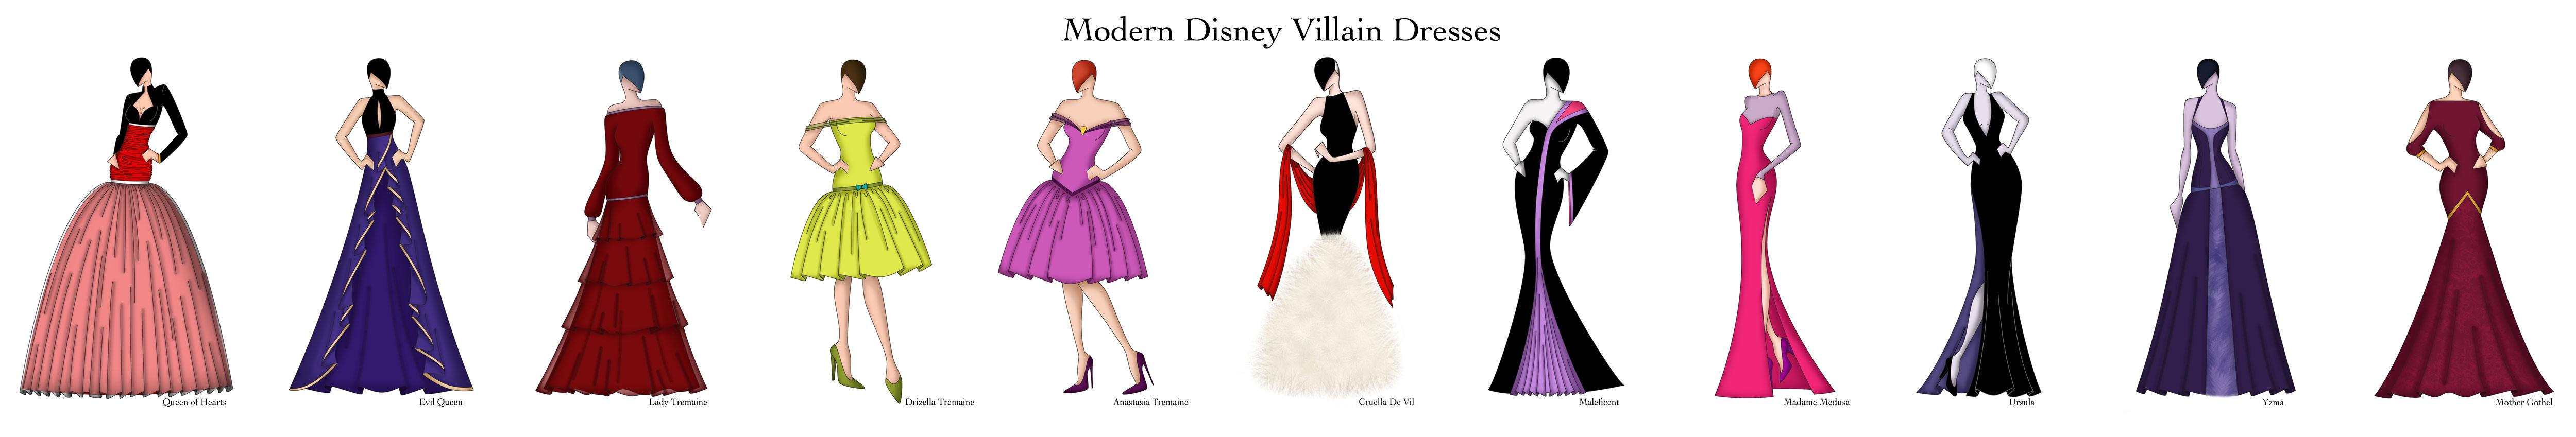 Disney Design Dresses